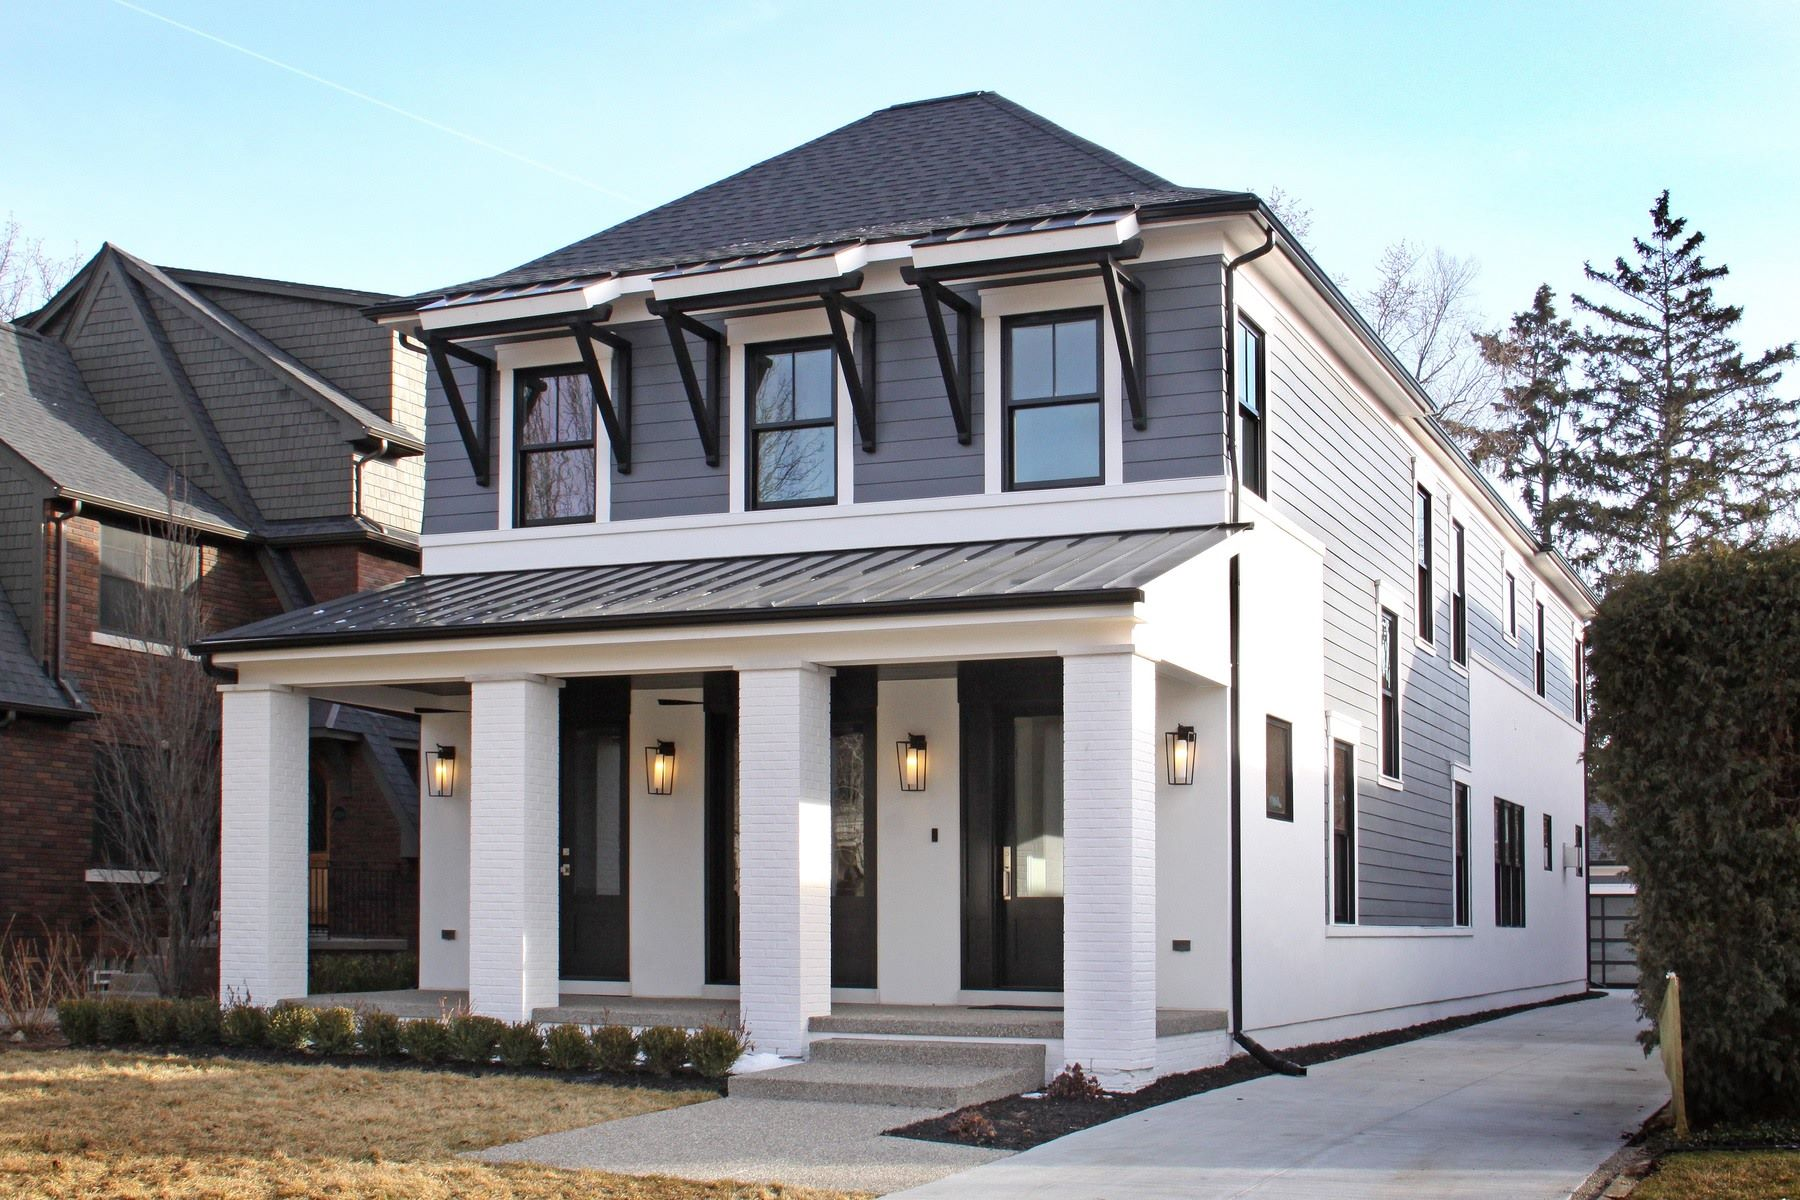 Single Family Homes for Active at Birmingham 873 Watkins Street Birmingham, Michigan 48009 United States